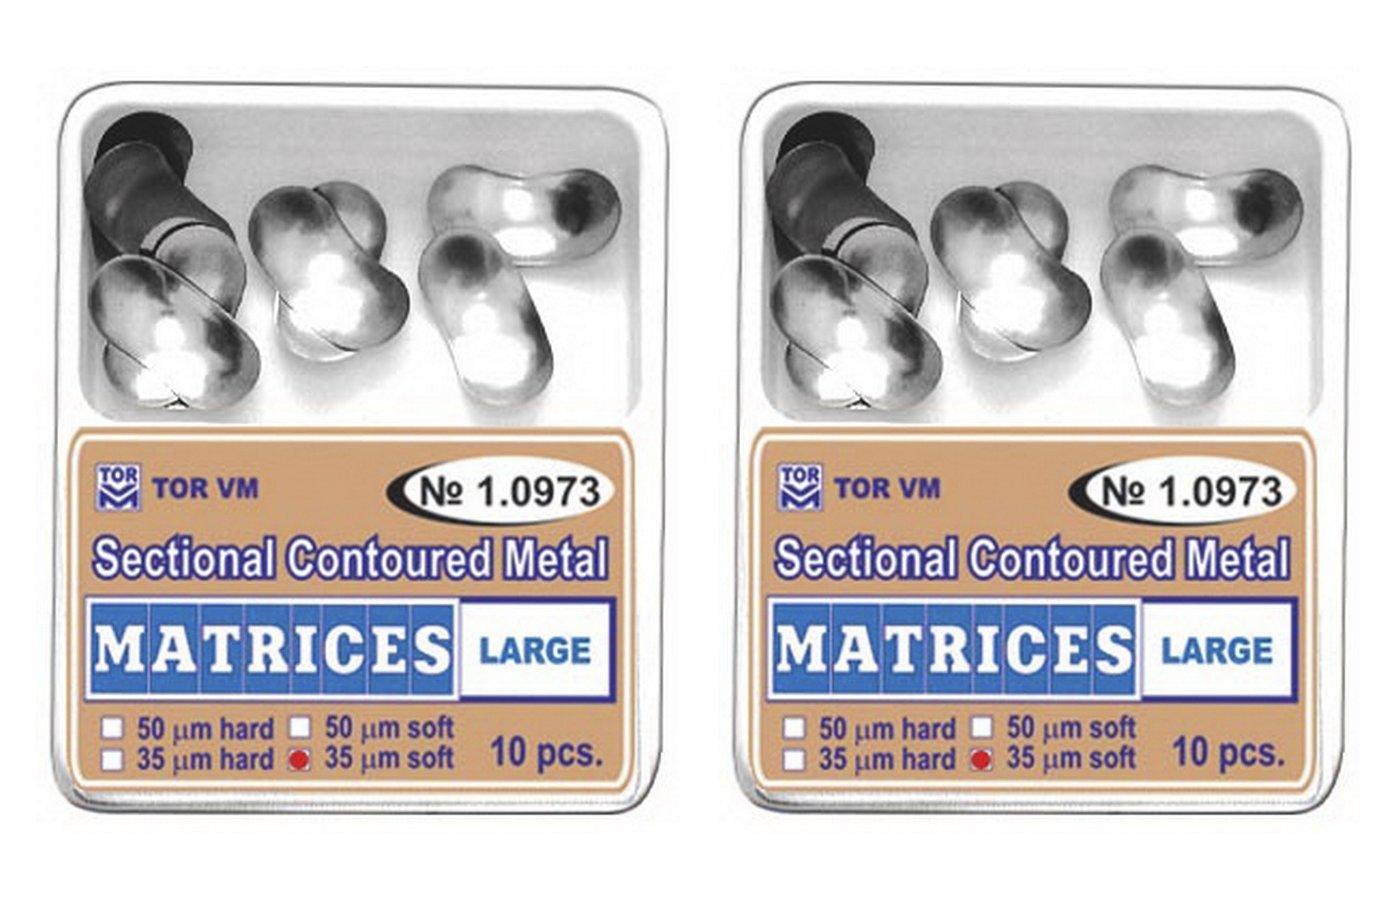 Dental Large Sectional Contoured Matrices Matrix TOR VM (20 pcs)